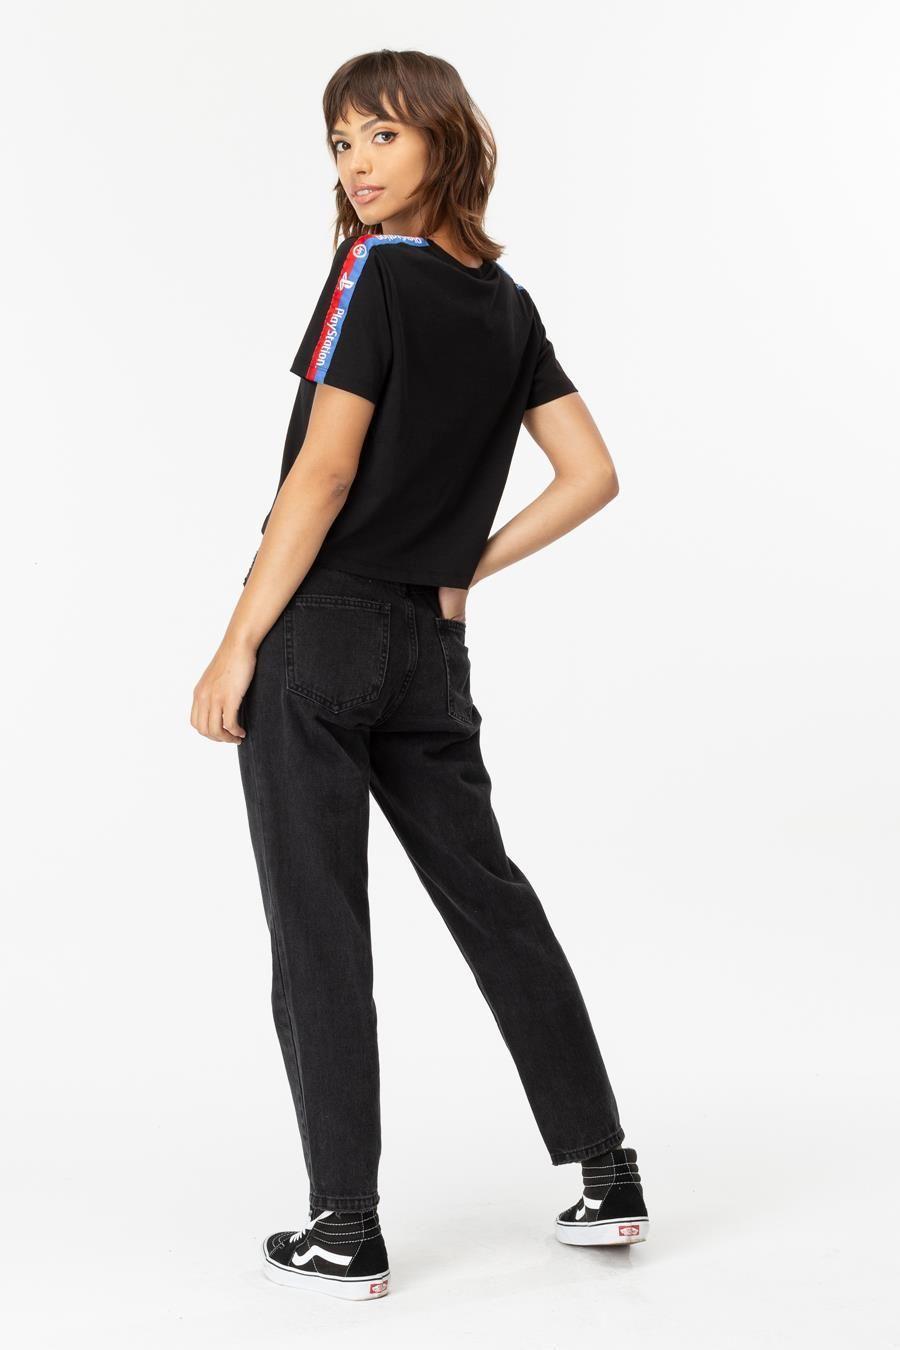 Hype Playstation Black Tape Womens Crop T-Shirt